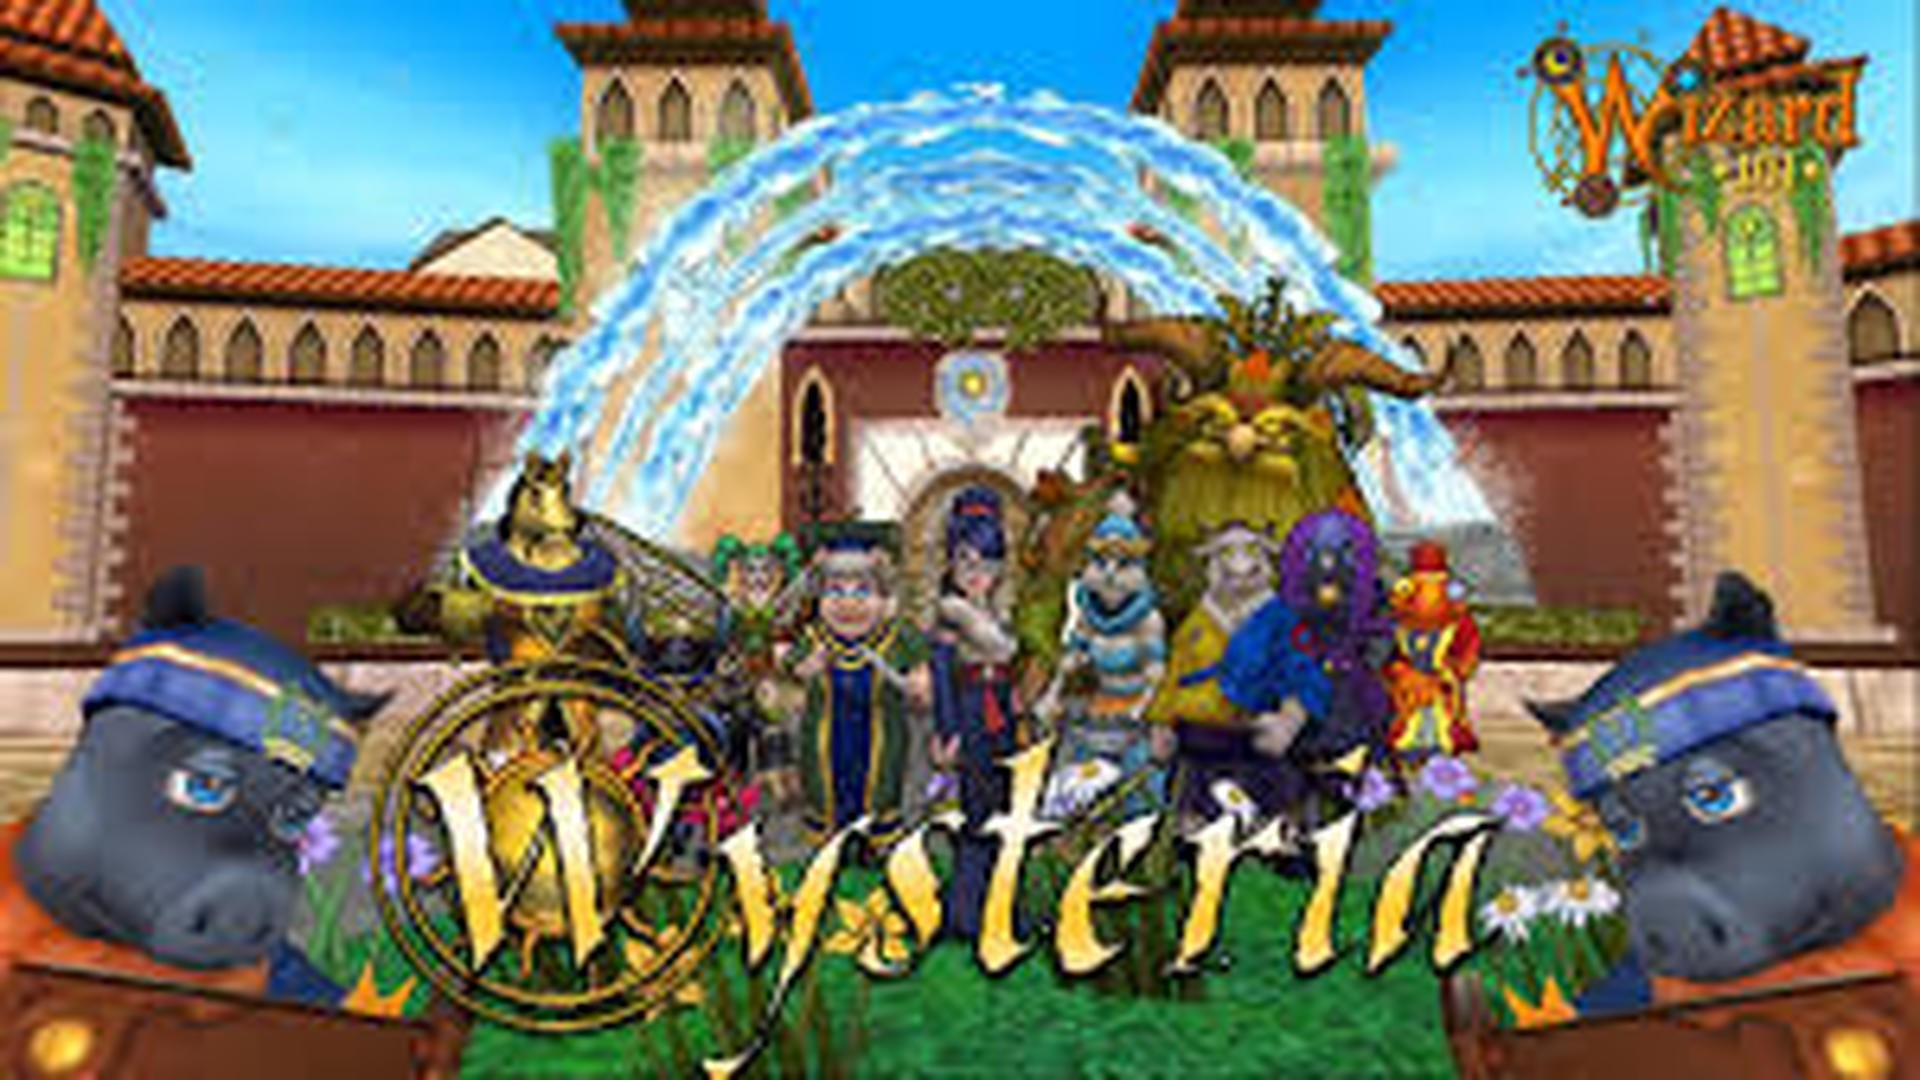 Res: 1920x1080, Frostcaller: Wizard Wallpapers 1024×768 Wizard101 Wallpapers (33 Wallpapers)  | Adorable Wallpapers